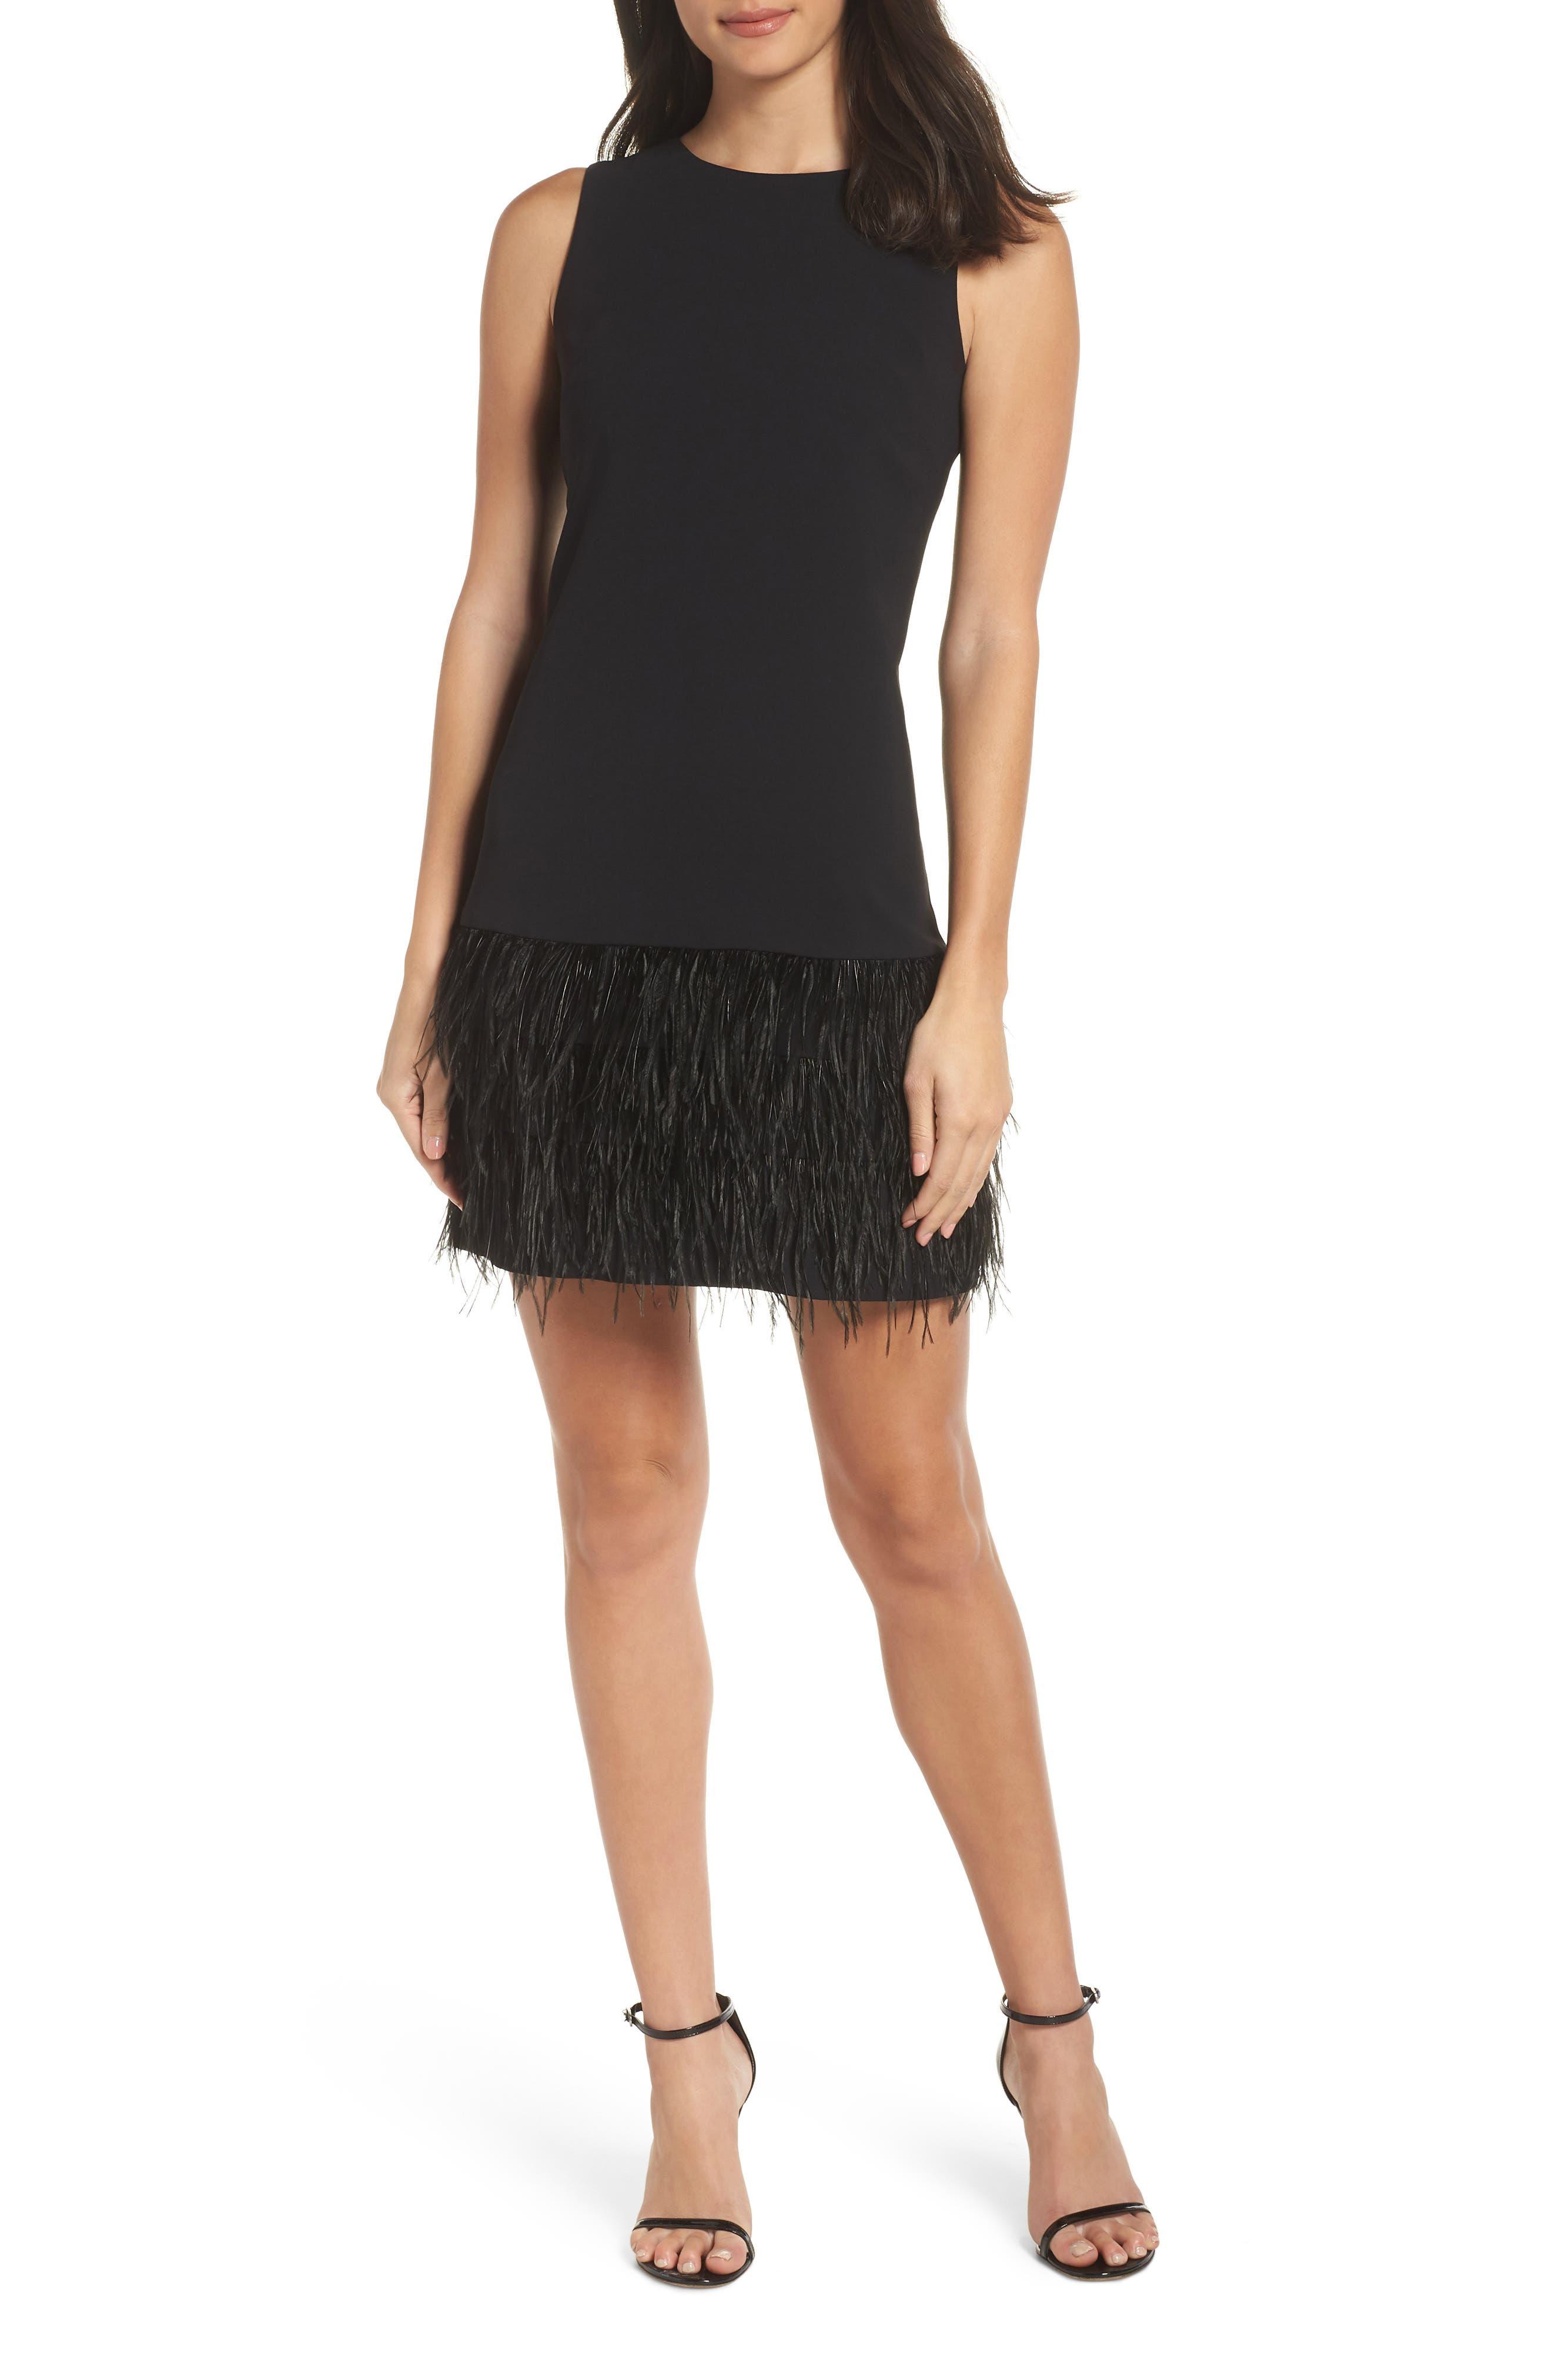 Vintage 1920s Dresses – Where to Buy Womens Sam Edelman Feather Hem Sheath Dress Size 14 - Black $94.80 AT vintagedancer.com